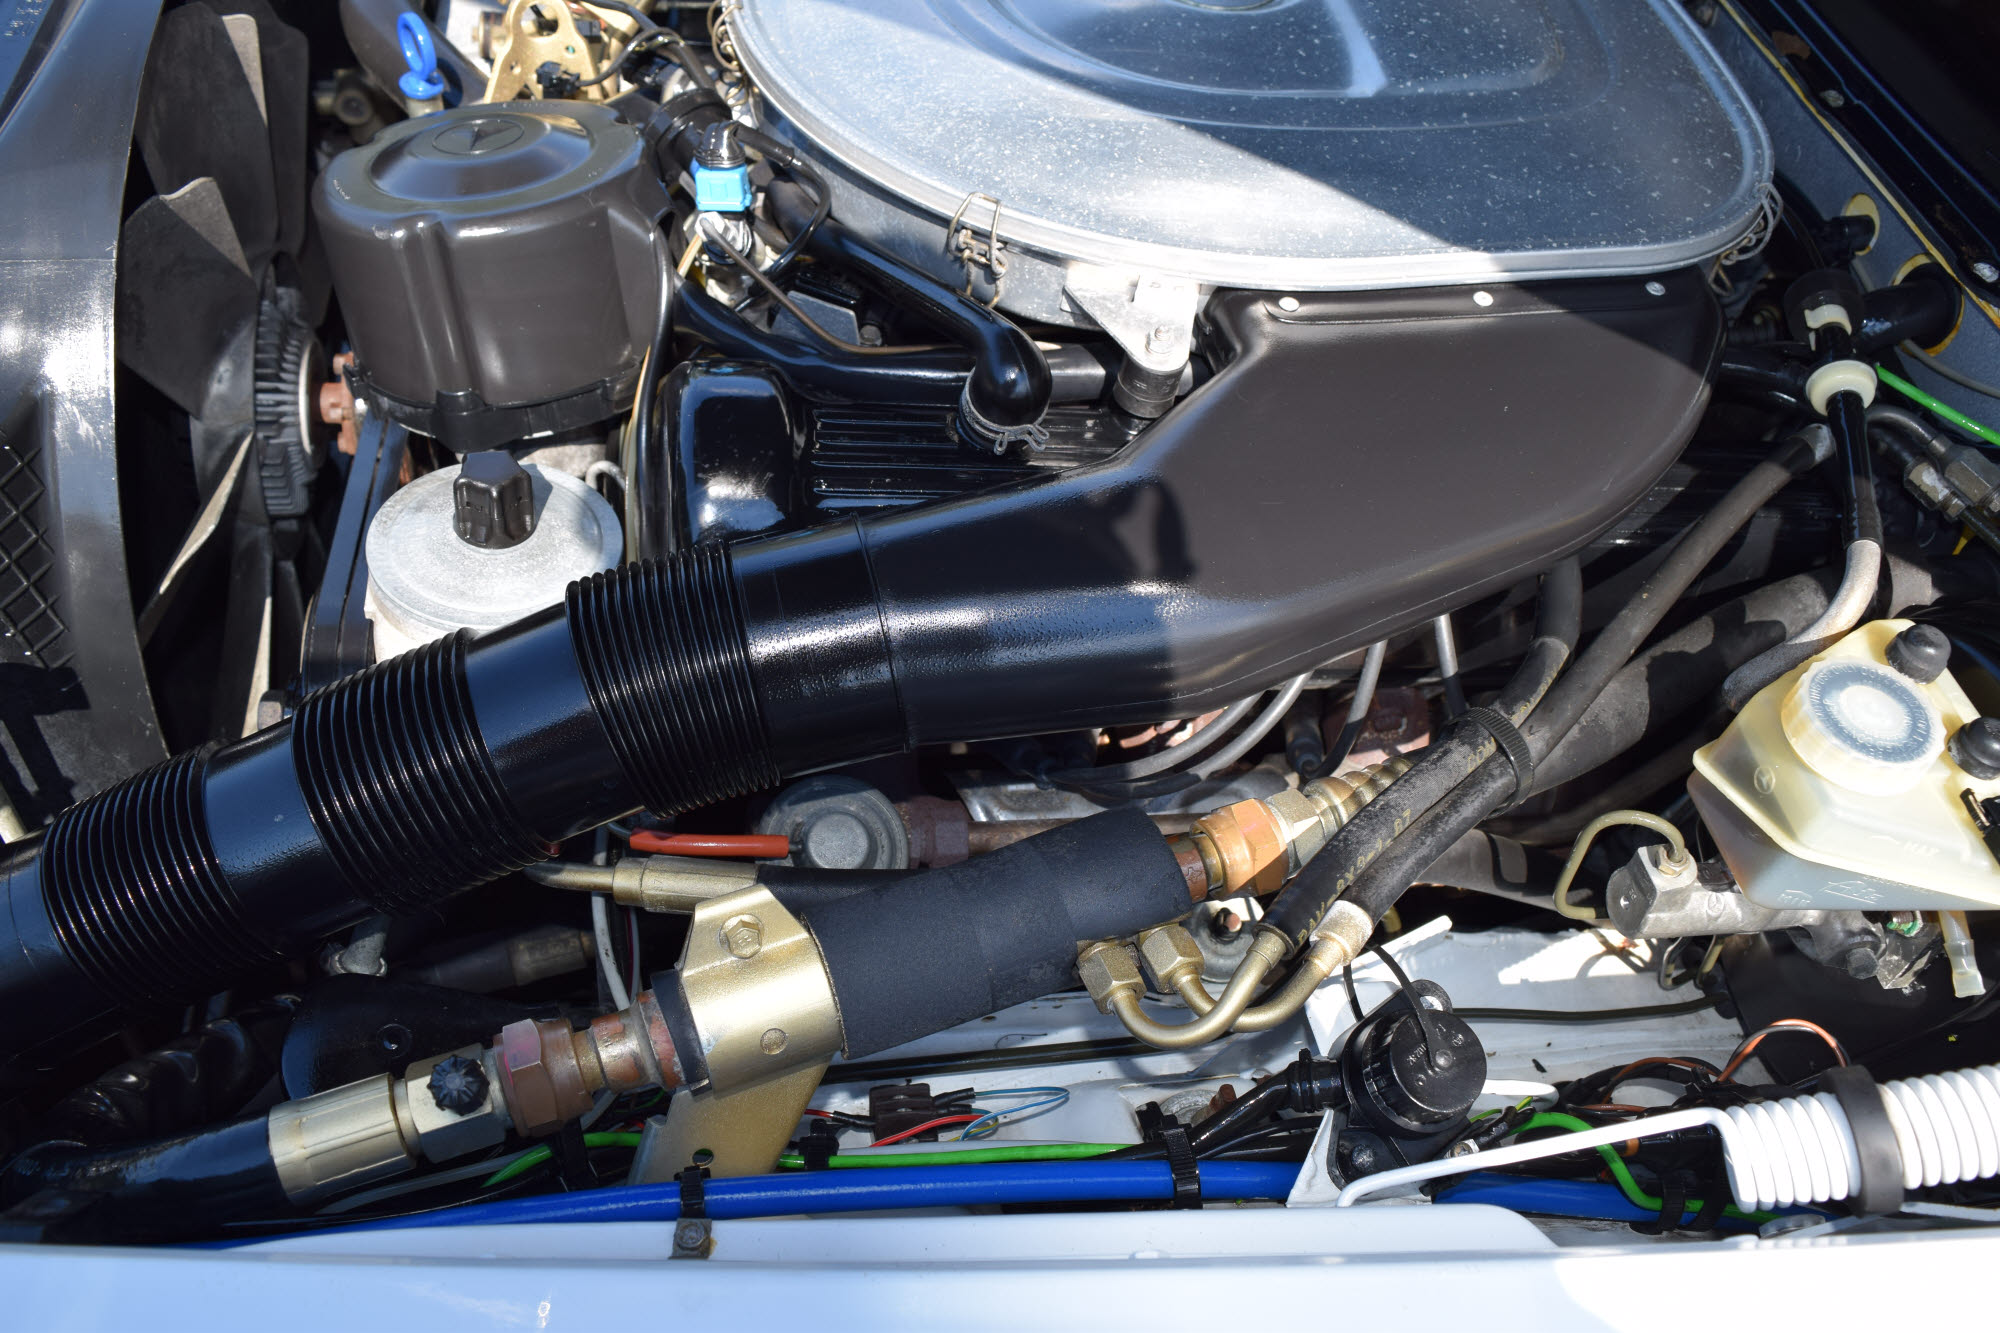 Dsc 0927 star motors ny star motors ny for Loan star motors 2